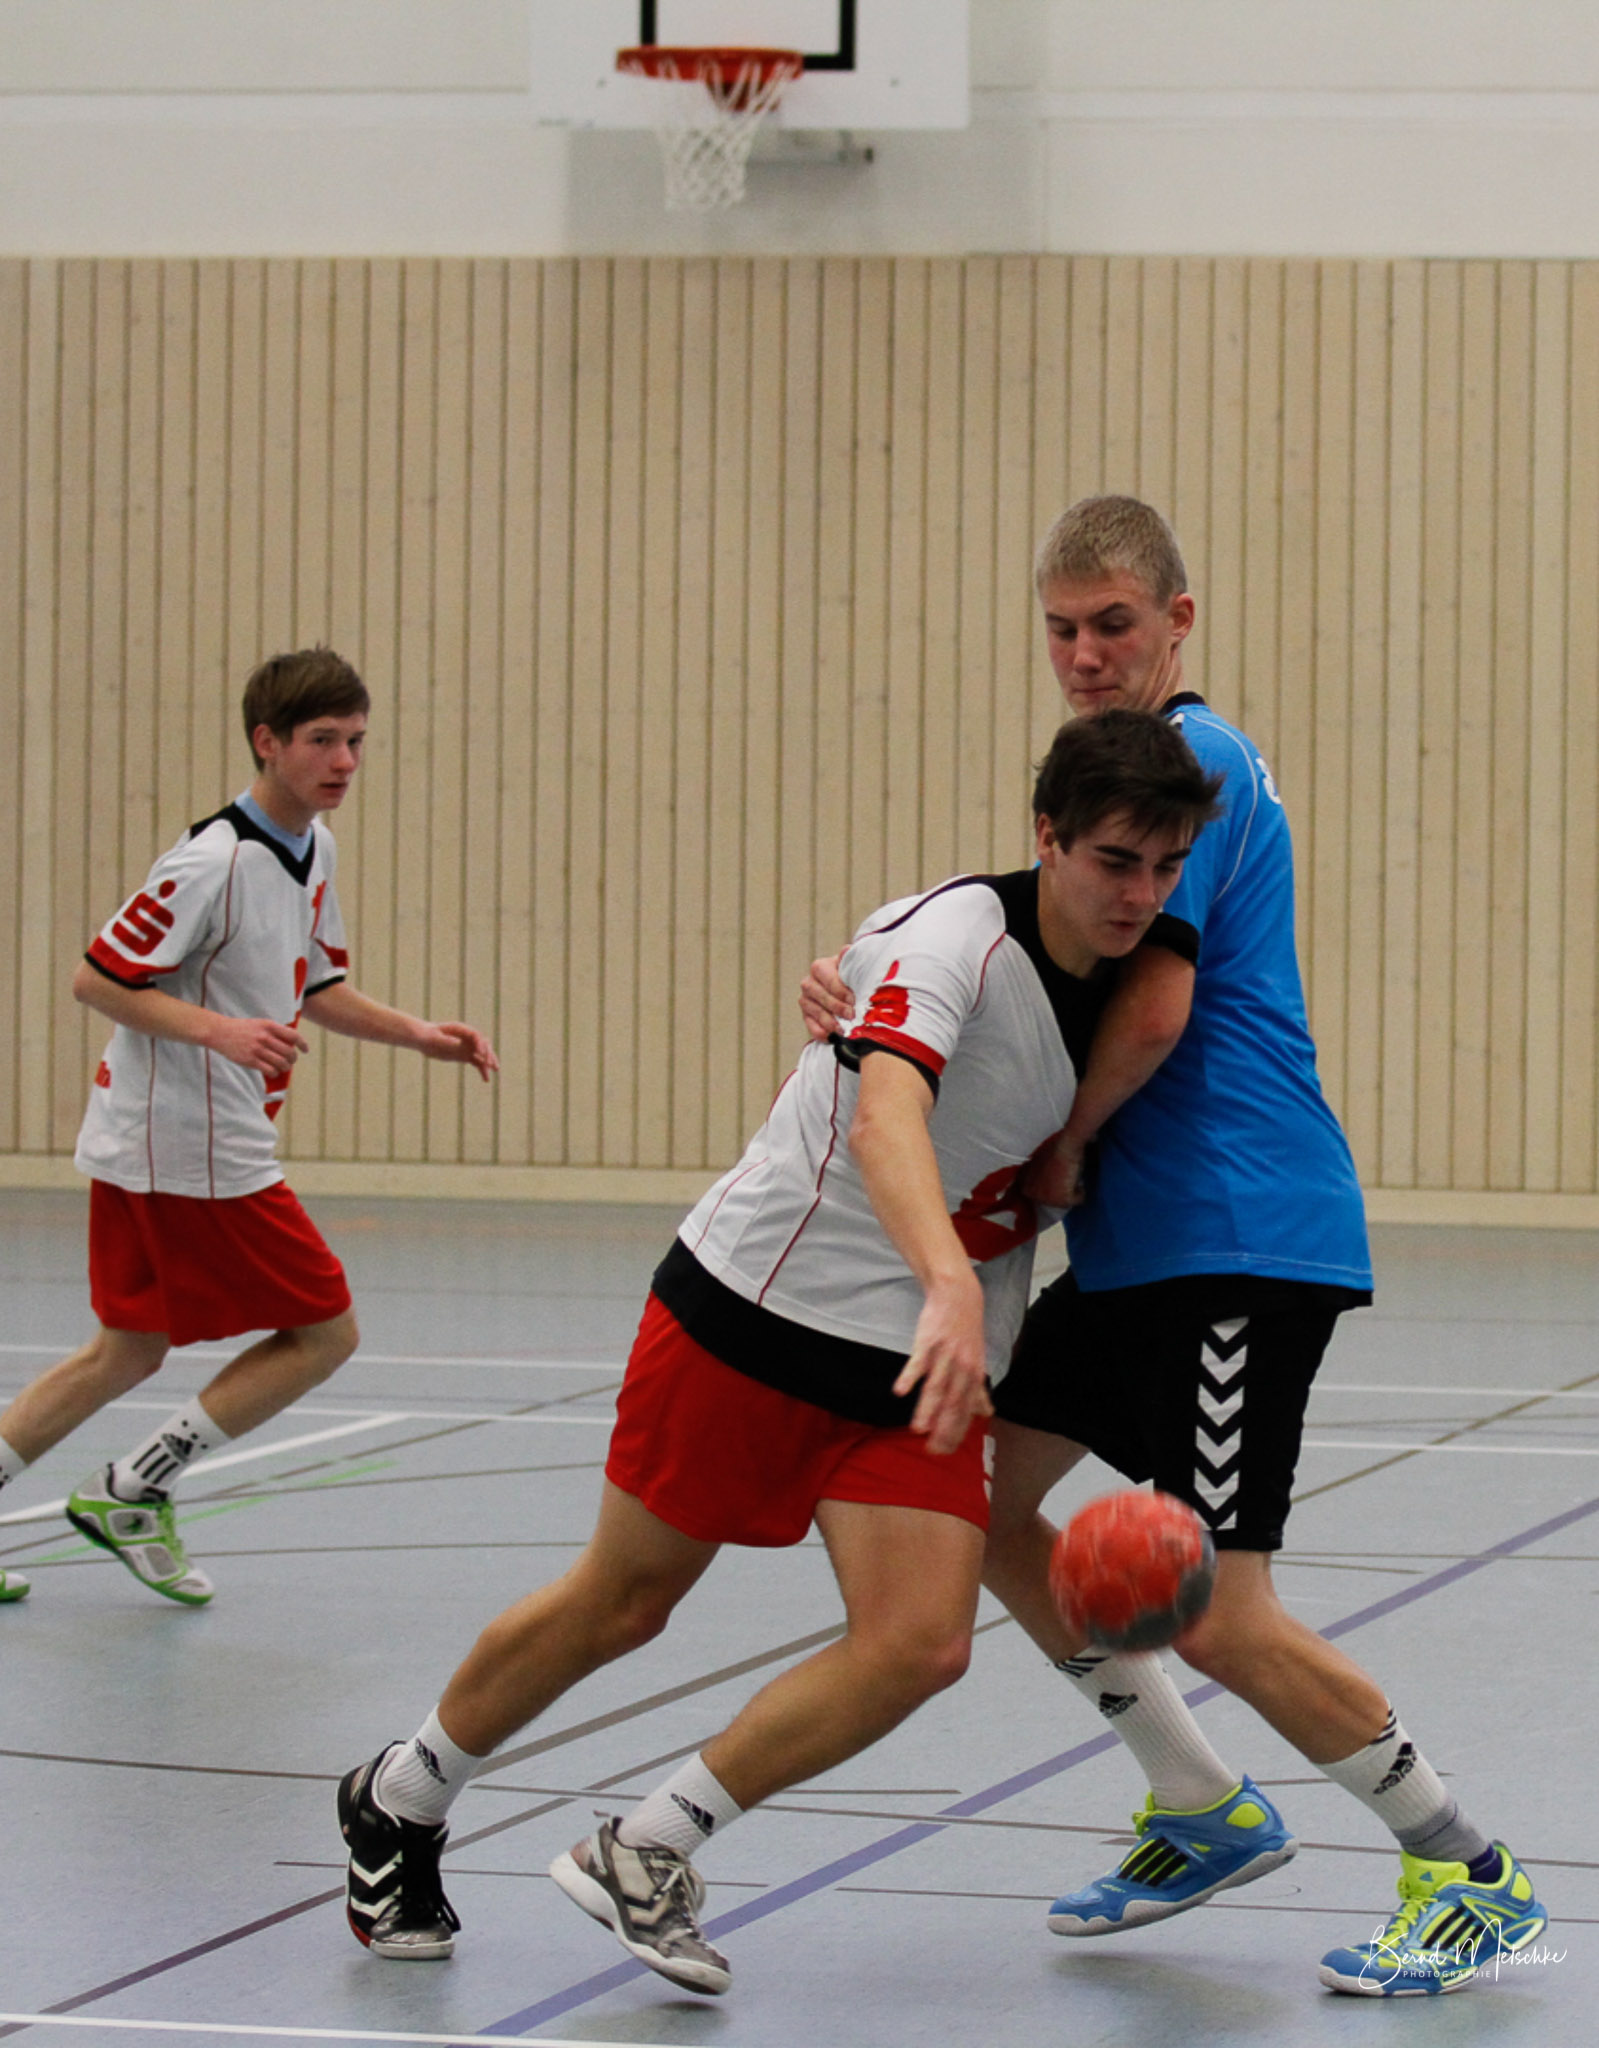 BHC - Claußnitz (12/2011)